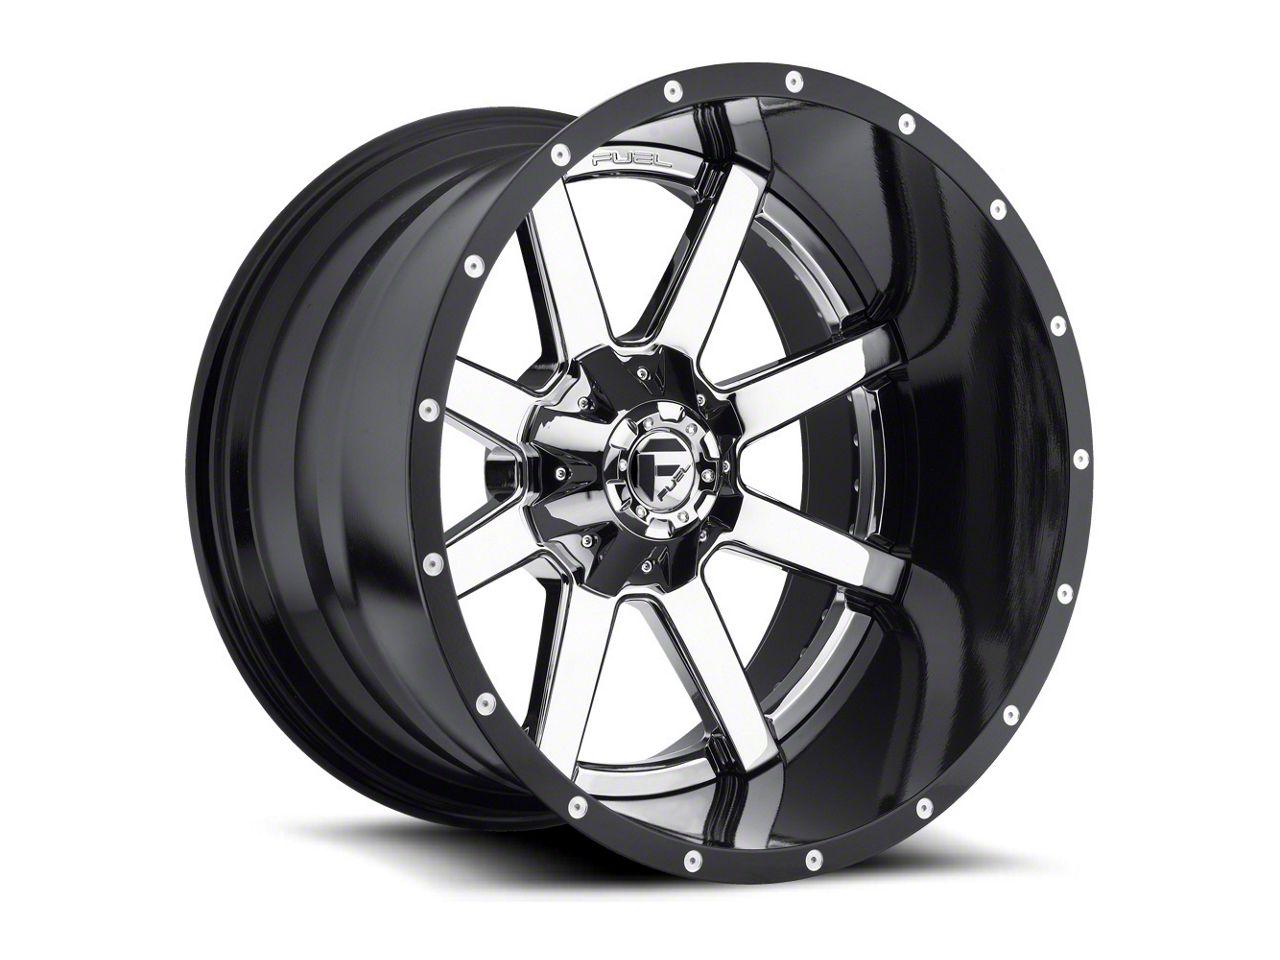 Fuel Wheels Maverick Chrome 6-Lug Wheel - 24x16 (07-18 Sierra 1500)